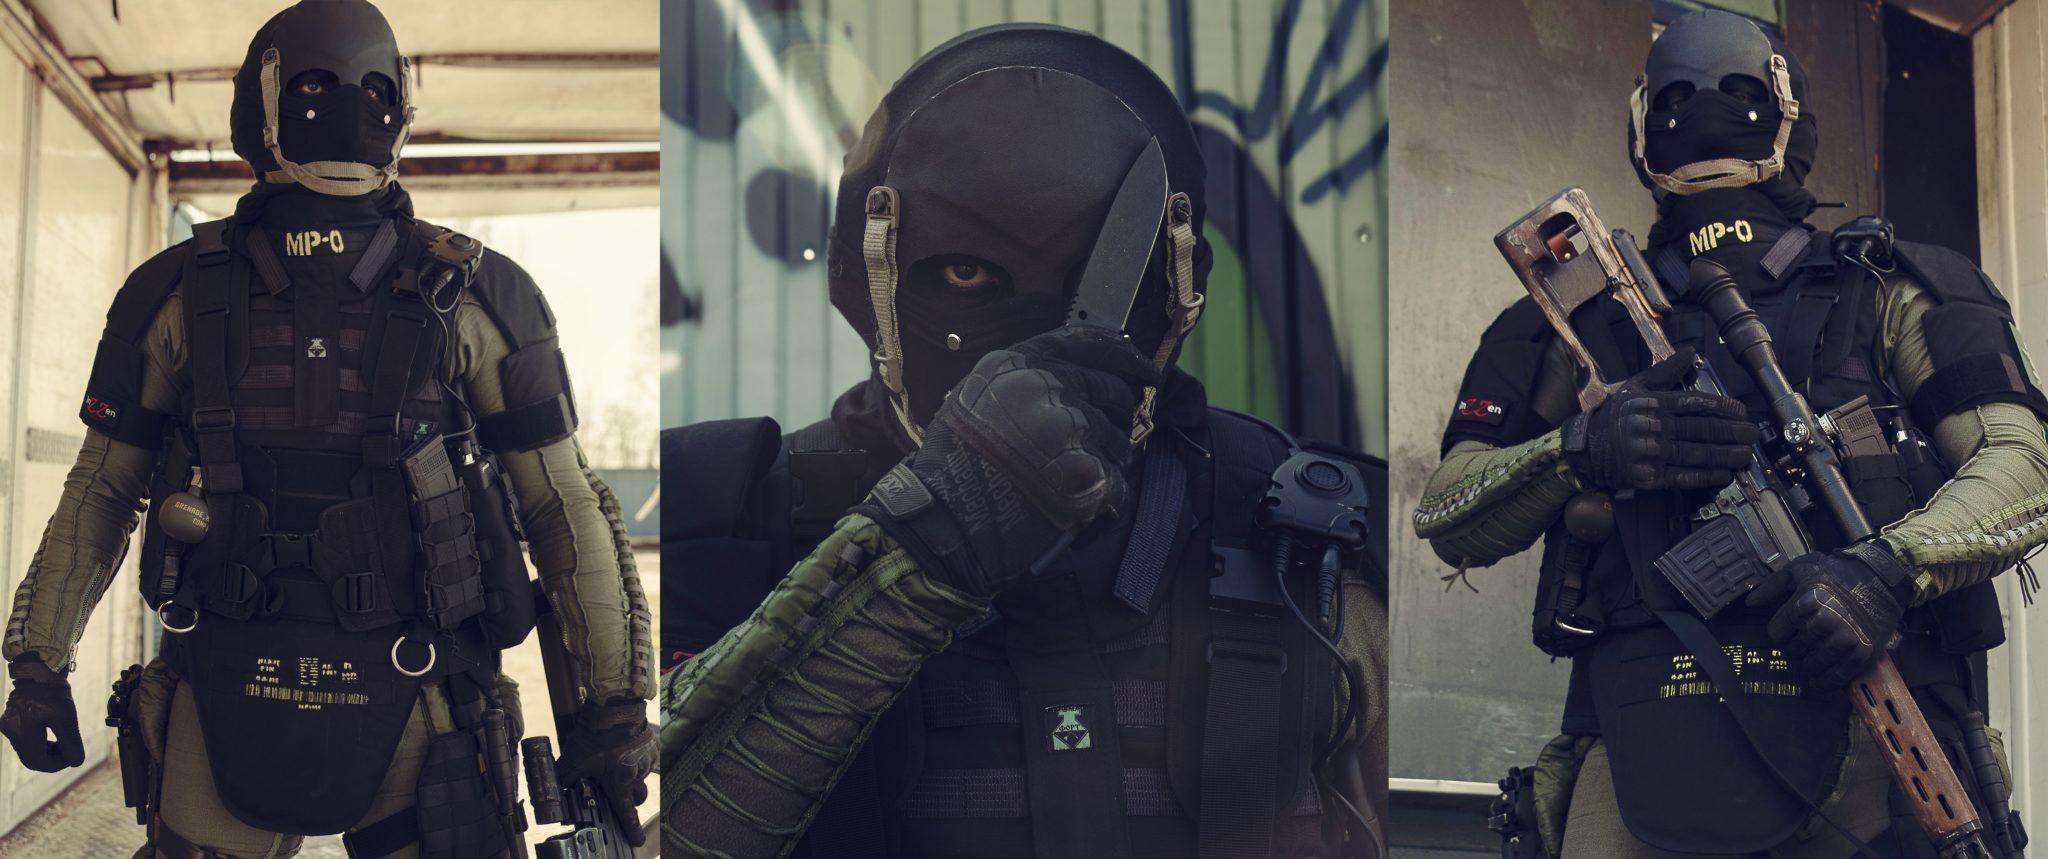 Inzzen's Nikto cosplay from Modern Warfare.